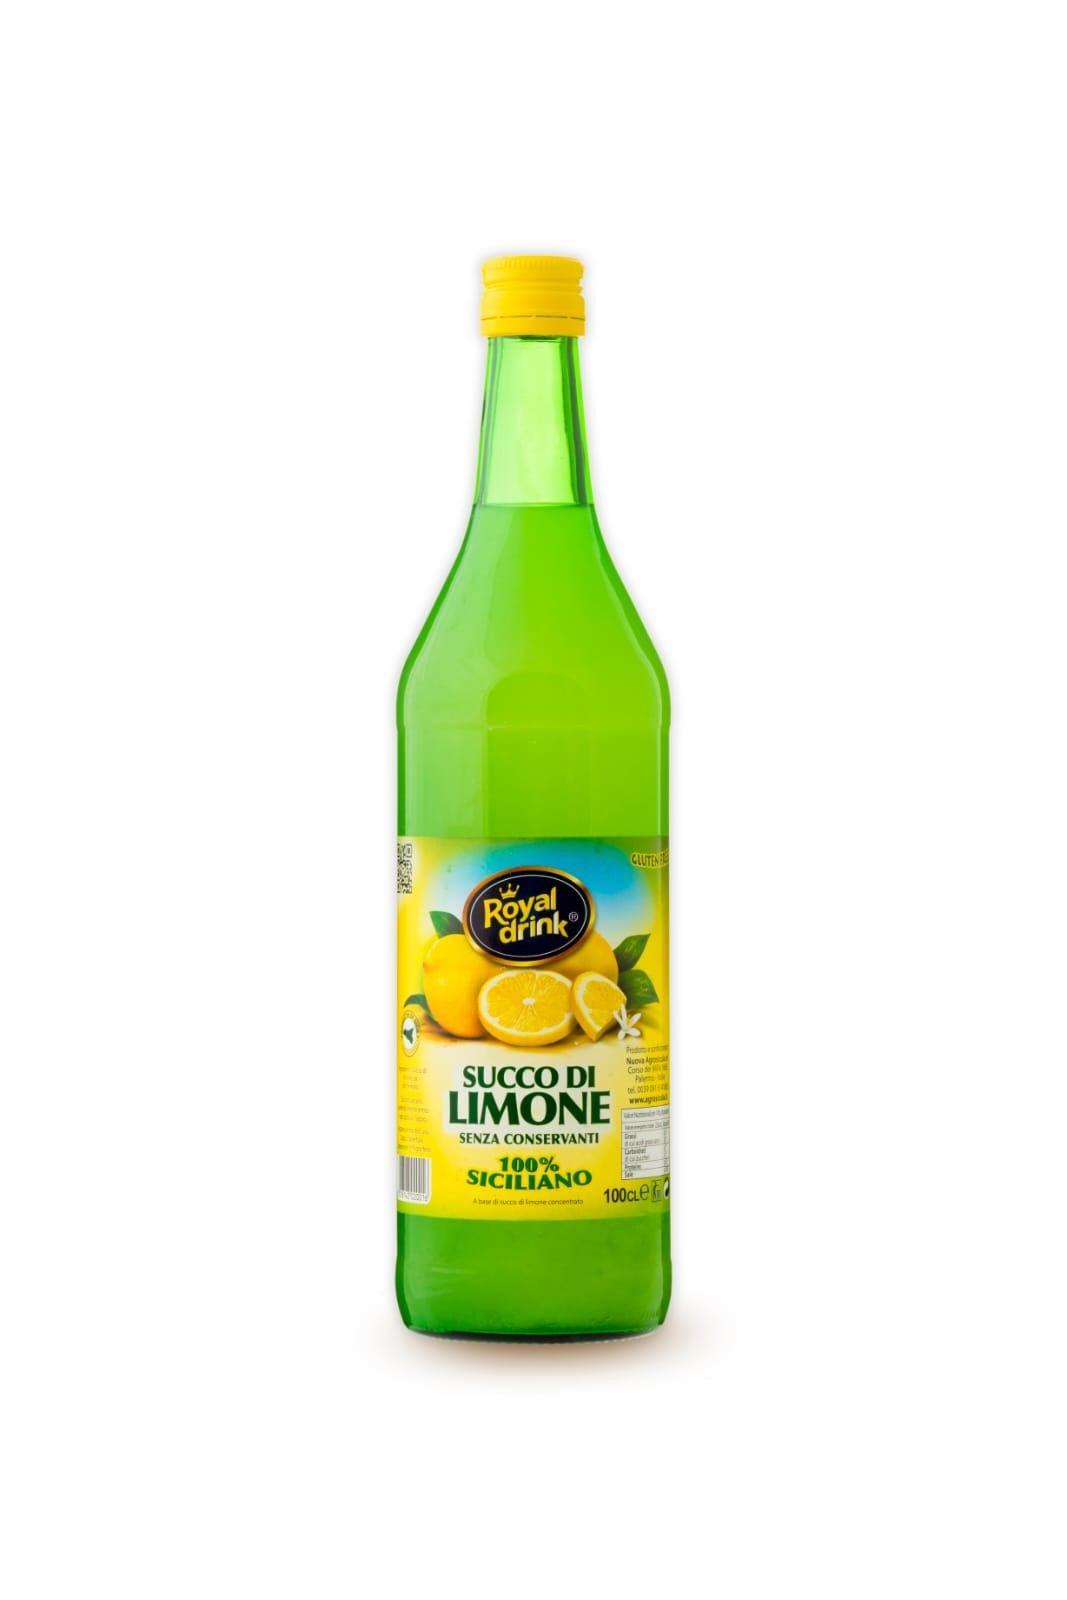 ROYAL DRINK - SUCCO DI LIMONE NATURALE 100% - LT. 1